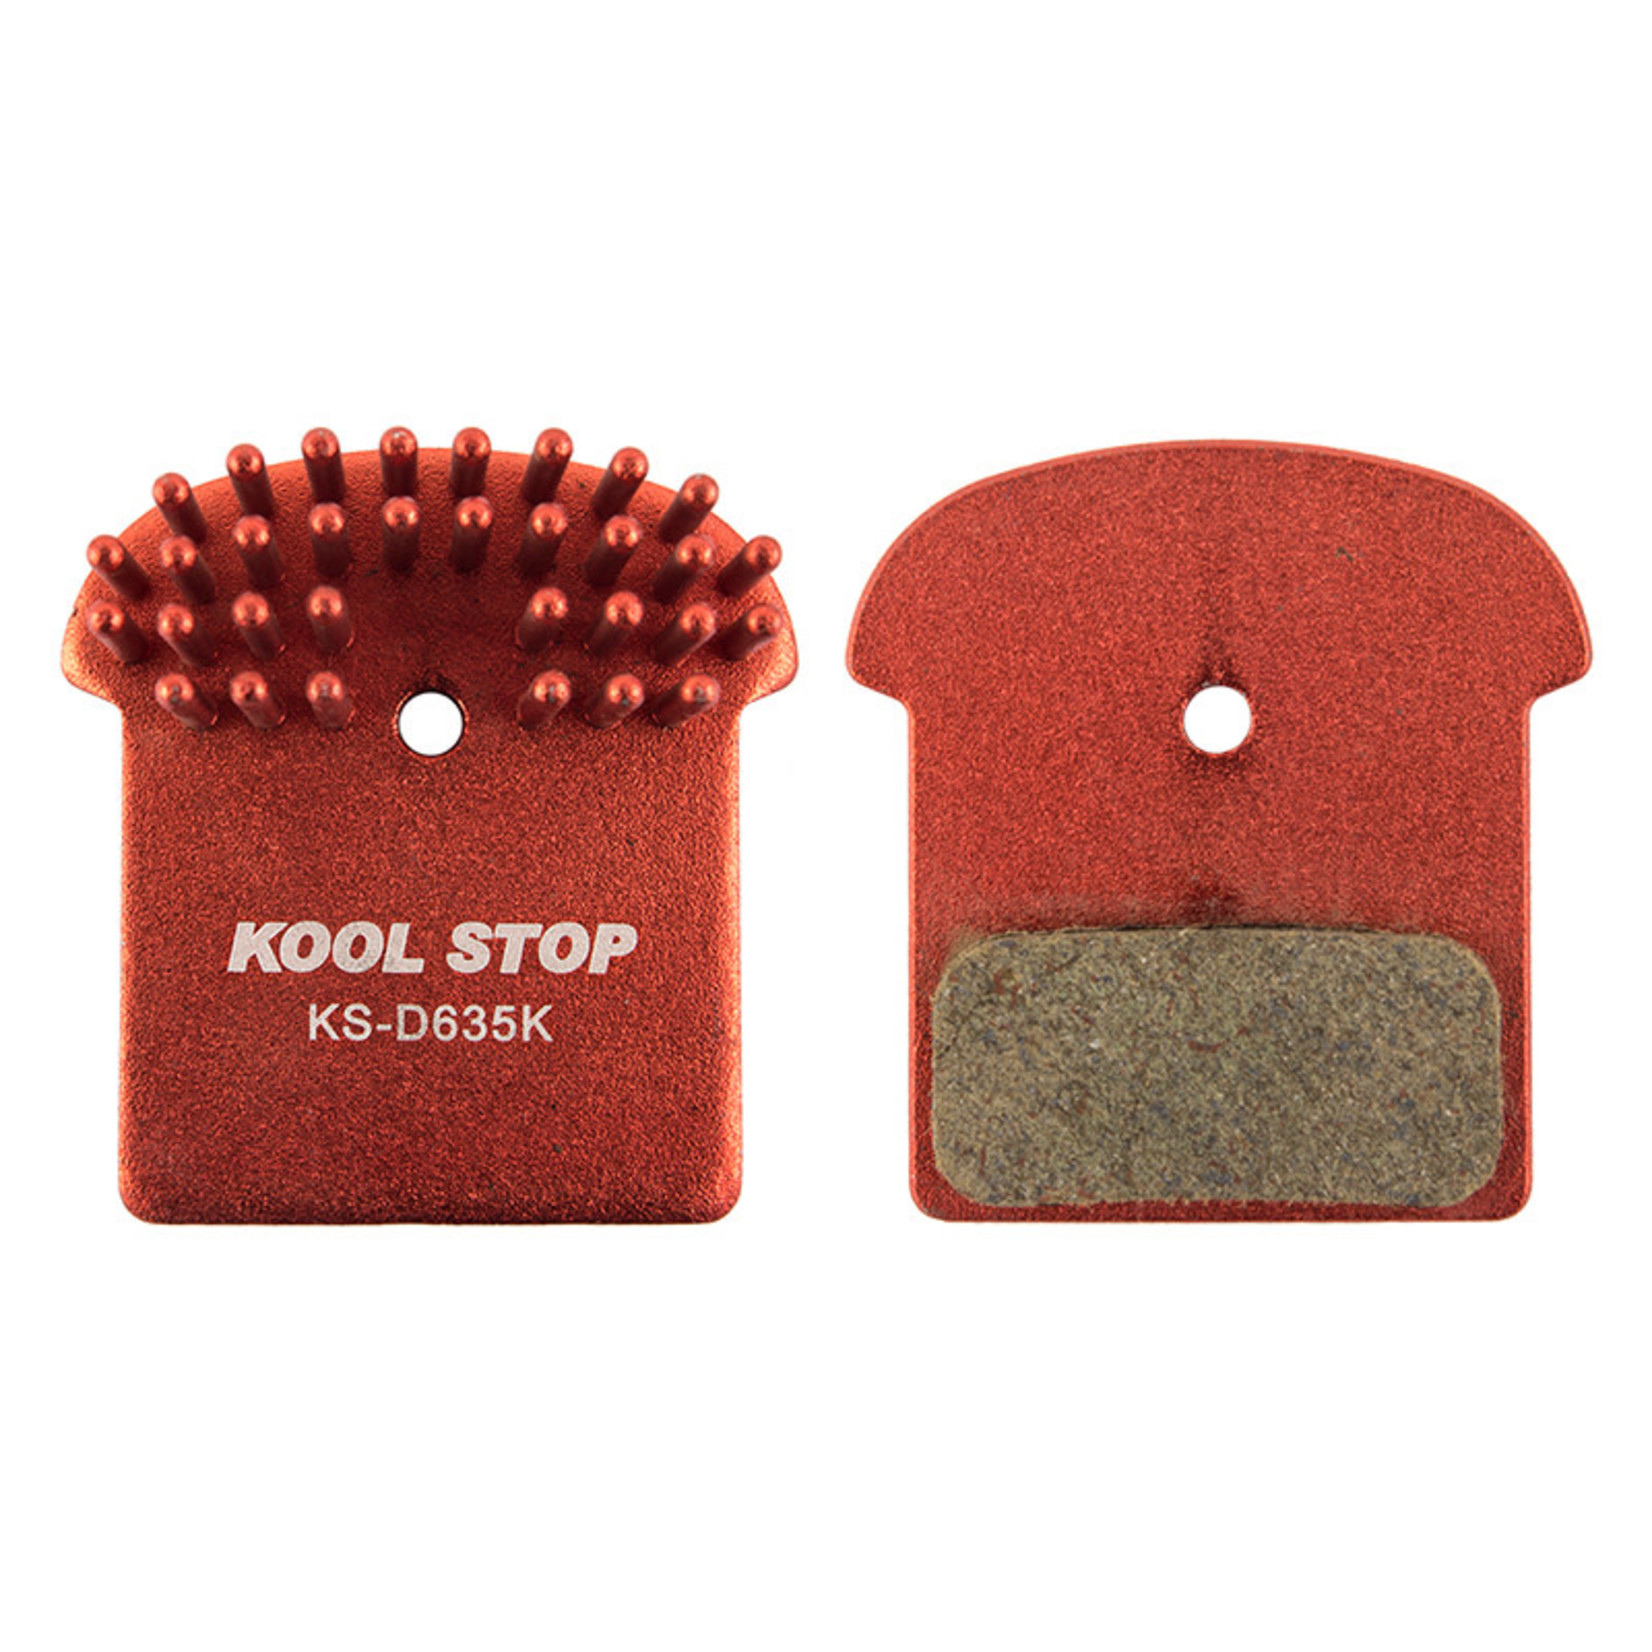 KOOLSTOP BRAKE SHOES K/S DISC SHI XTR XT SLX AERO-KOOL ORGANIC M985/785/666